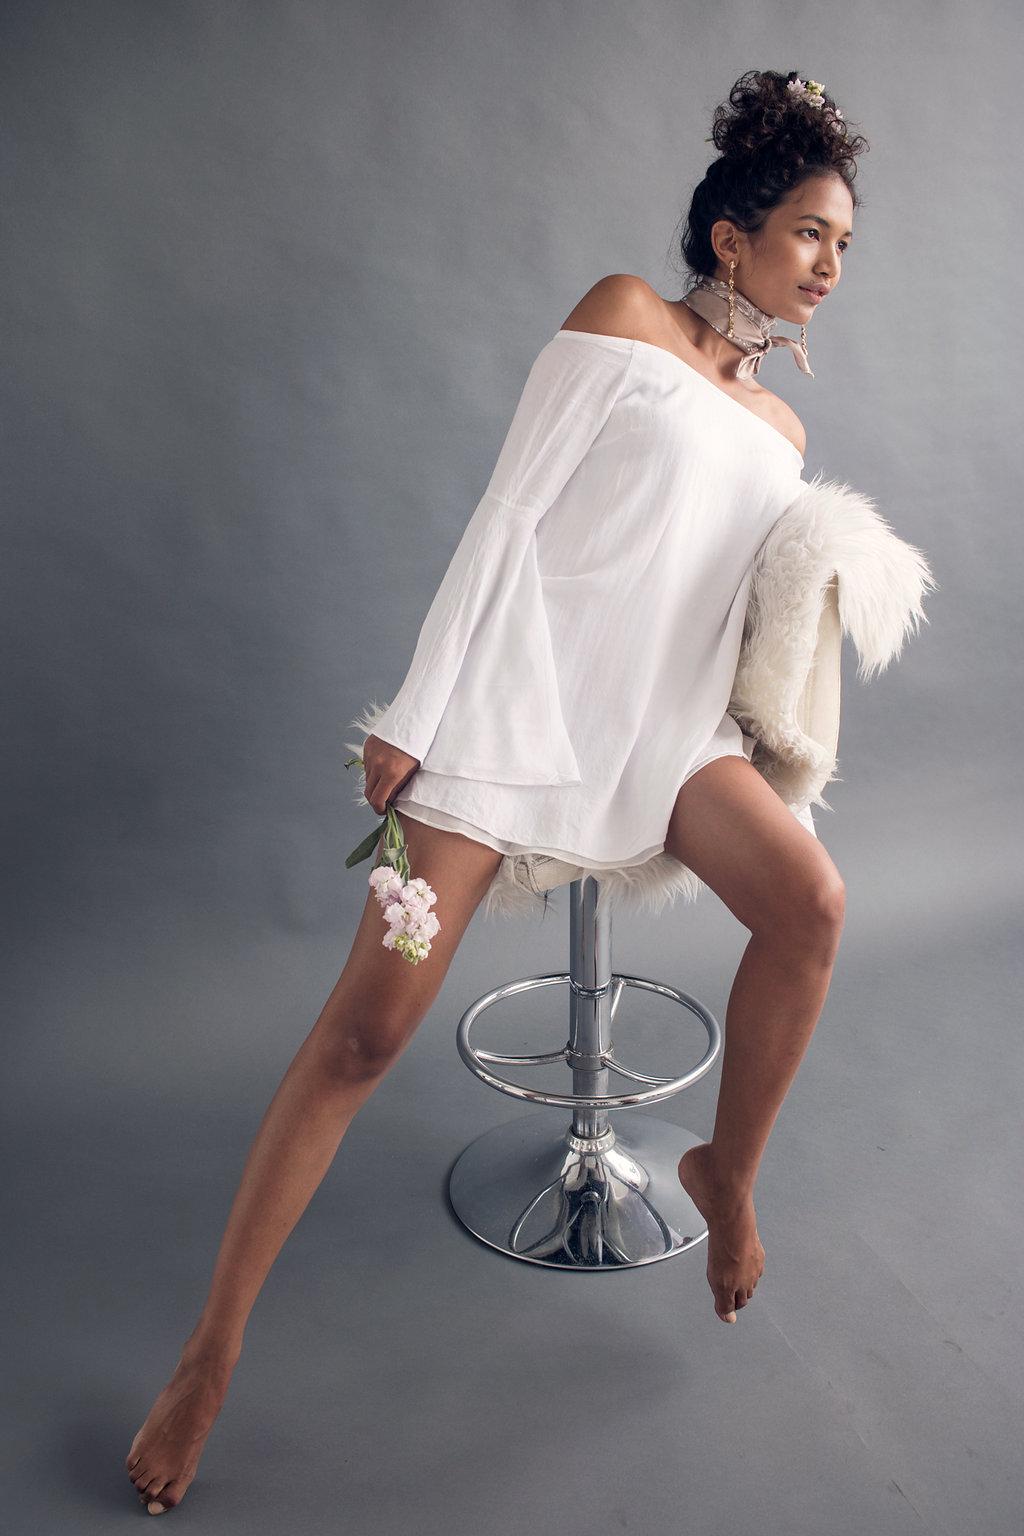 - Photographer: Vince PatrickModel: Kristina Menissov [Aston Models]Stylist & Props: Cassidy Bliss Cooper